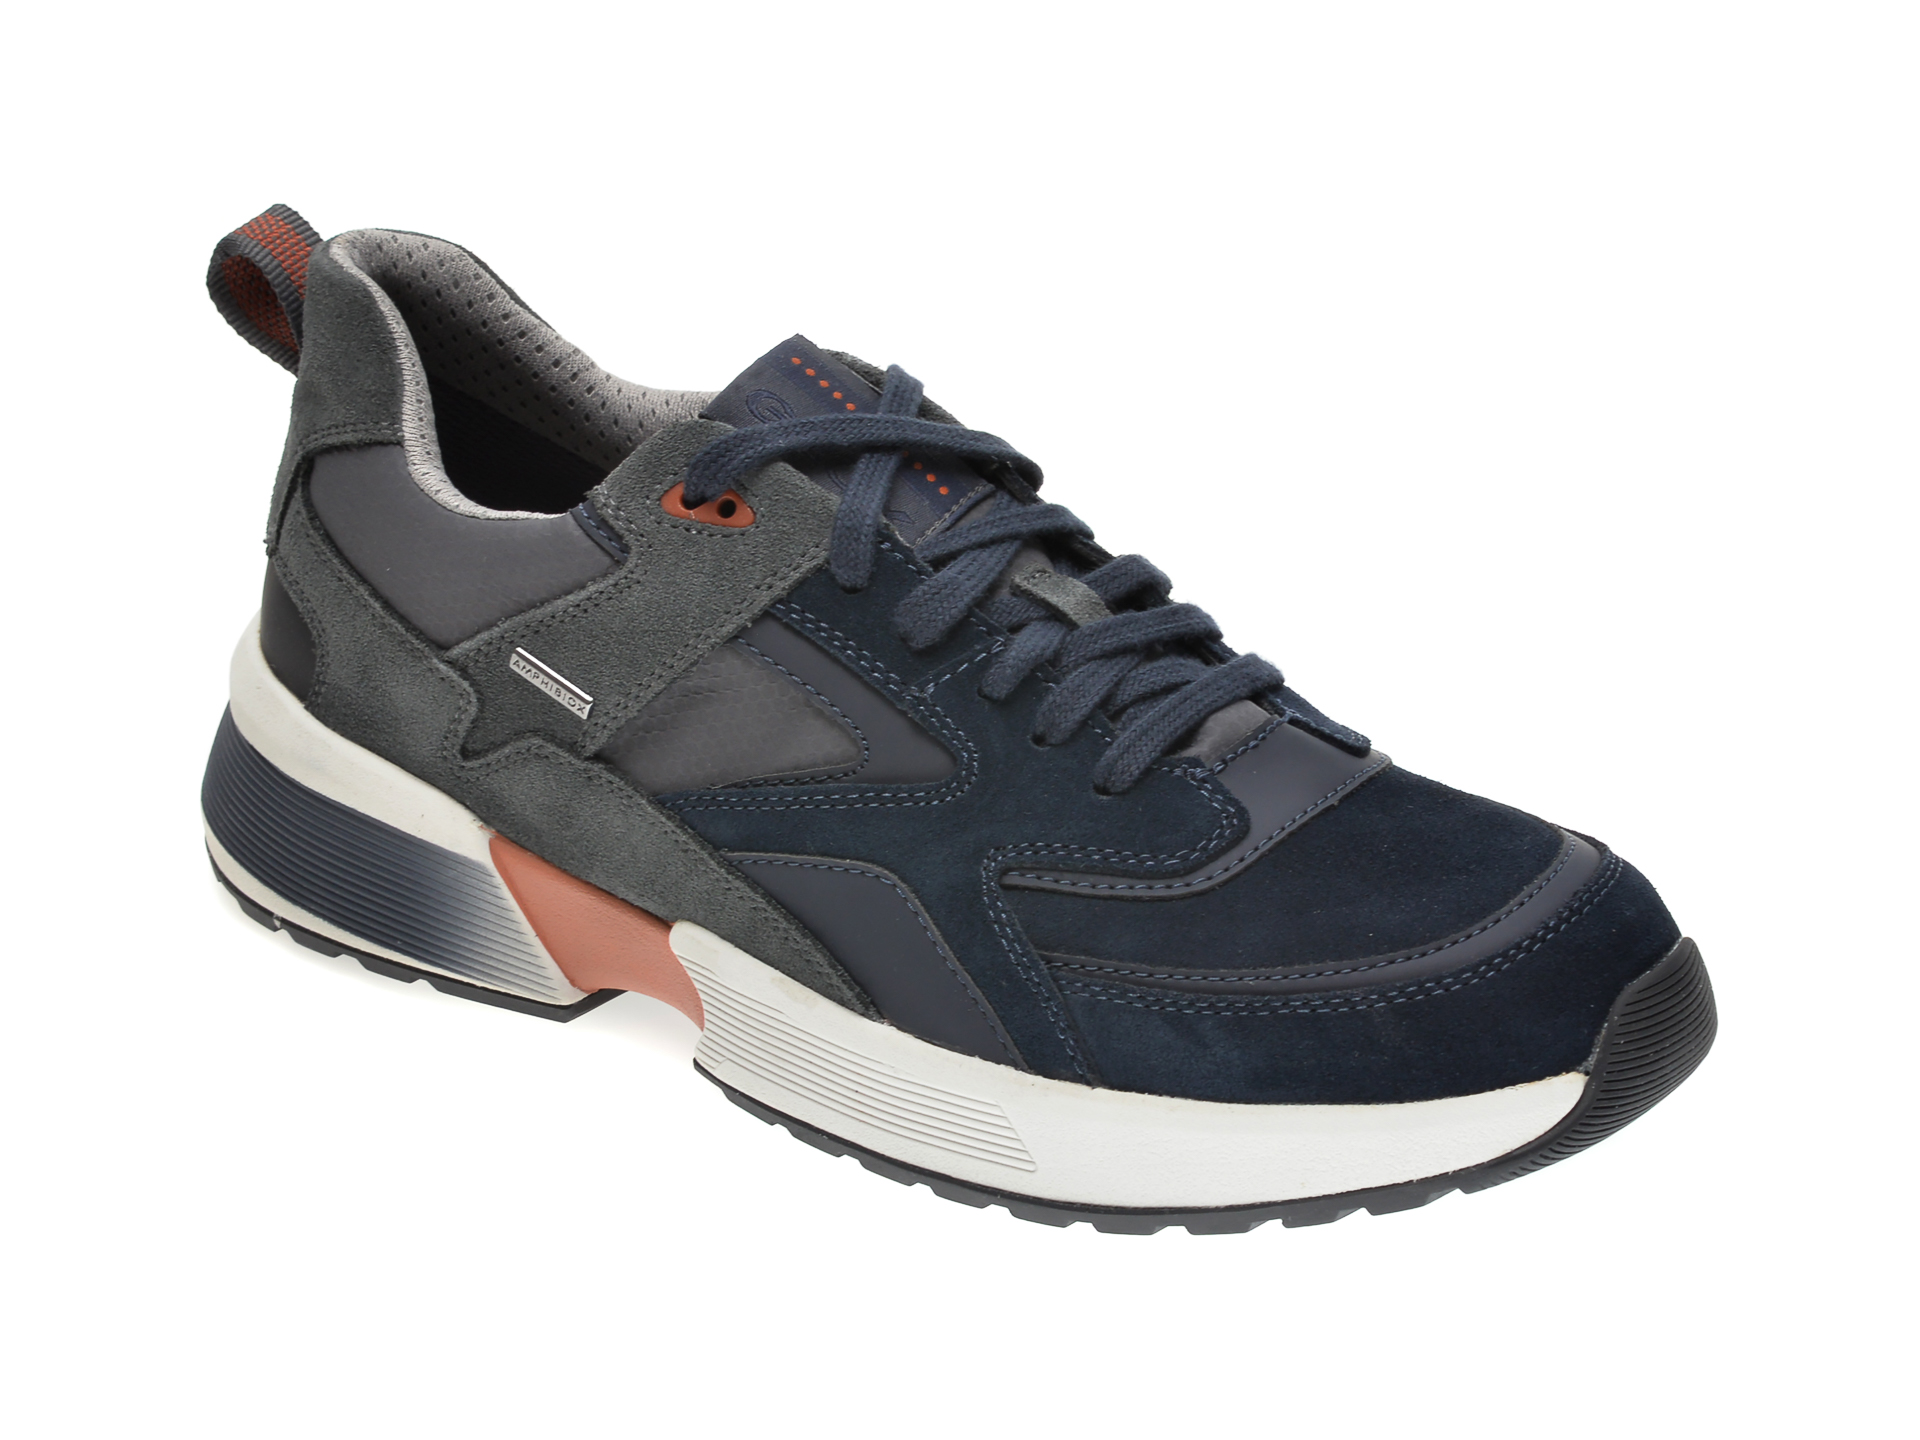 Pantofi Sport Geox Gri, U04aua, Din Piele Intoarsa